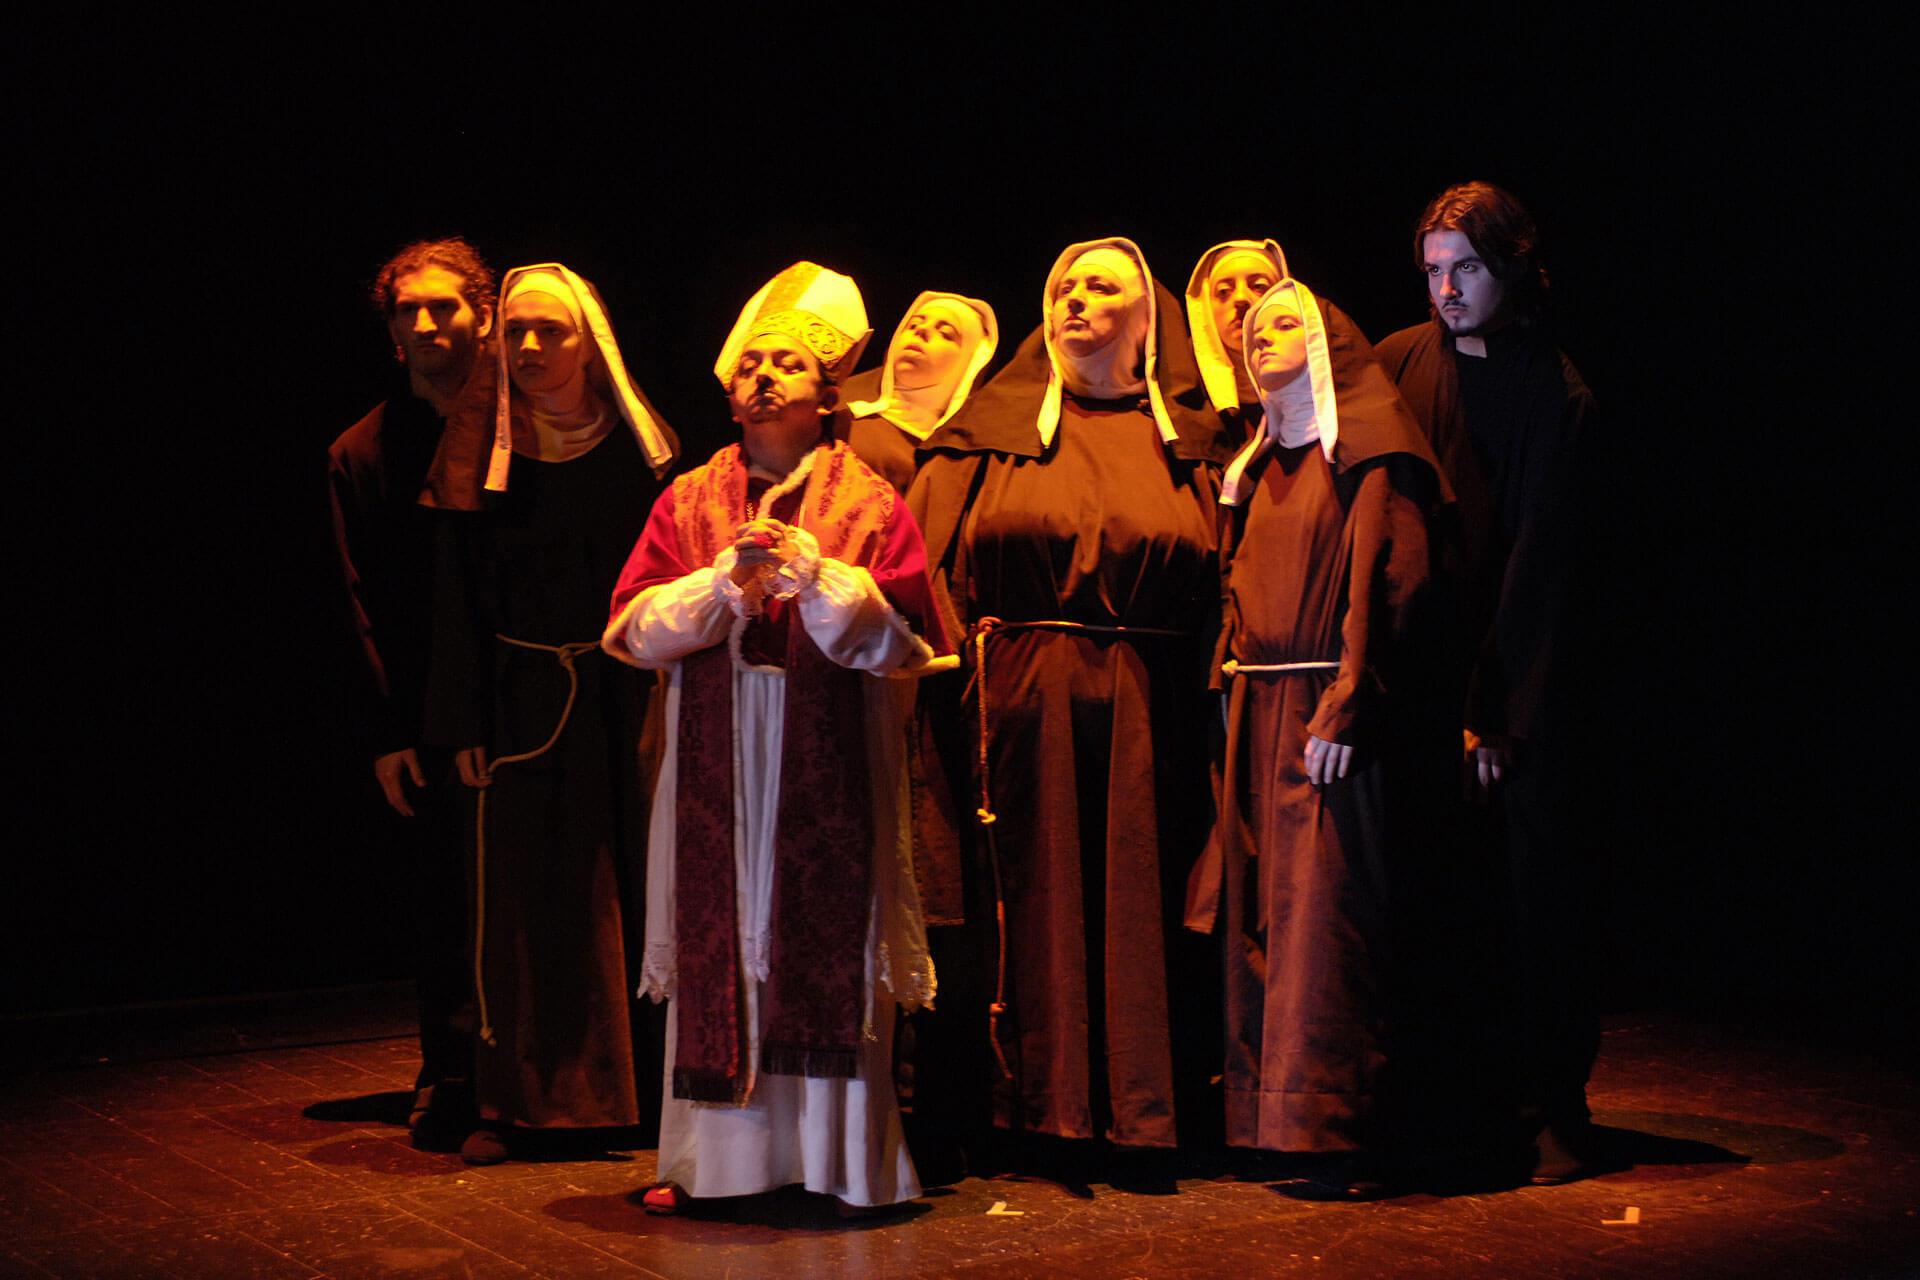 gruppo-teatro-colli-galilei-2005-7